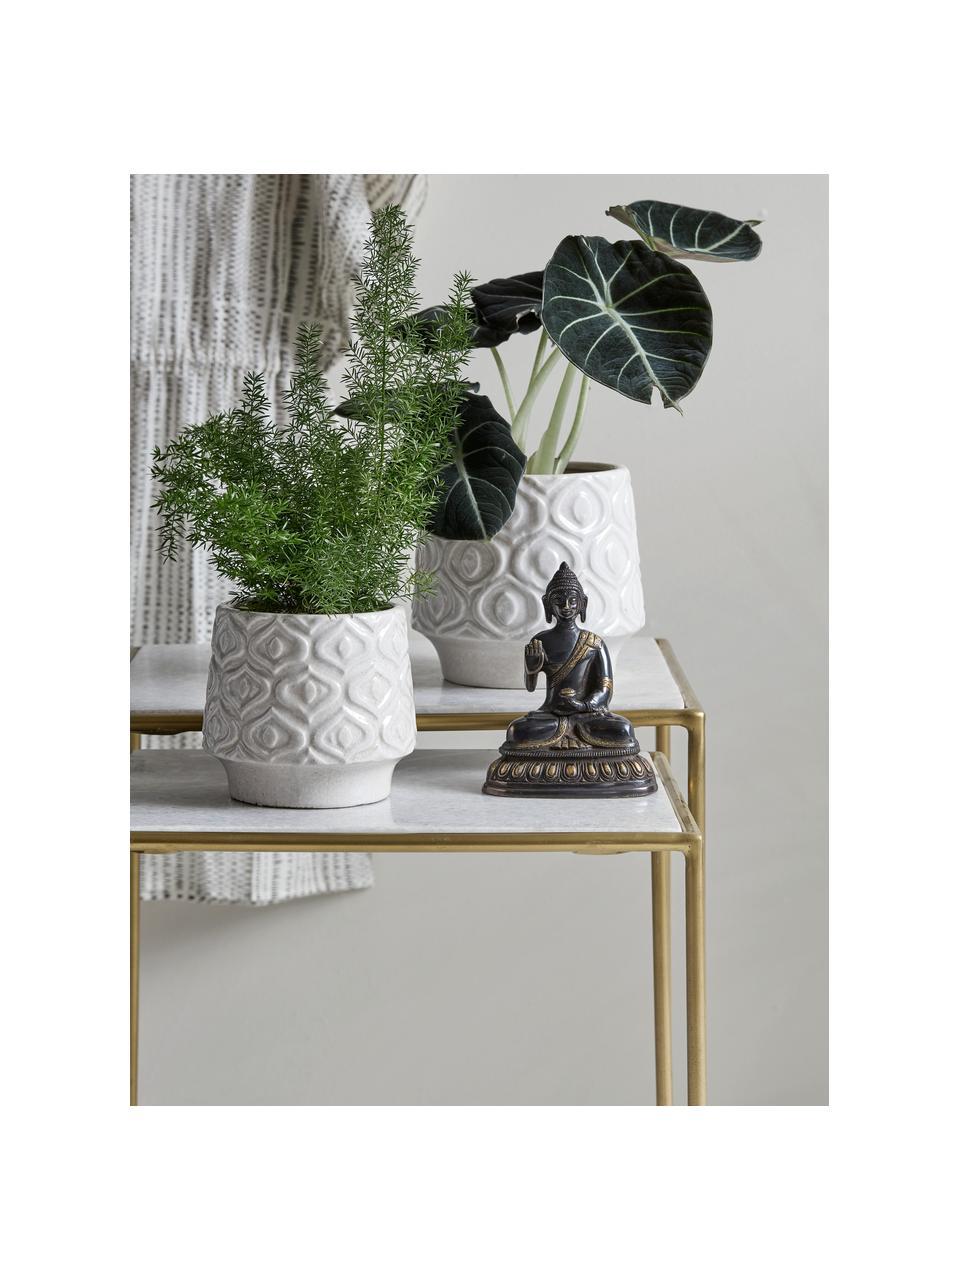 Marmor-Beistelltisch 2er-Set Zoe, Gestell: Metall, lackiert, Weiß, Sondergrößen